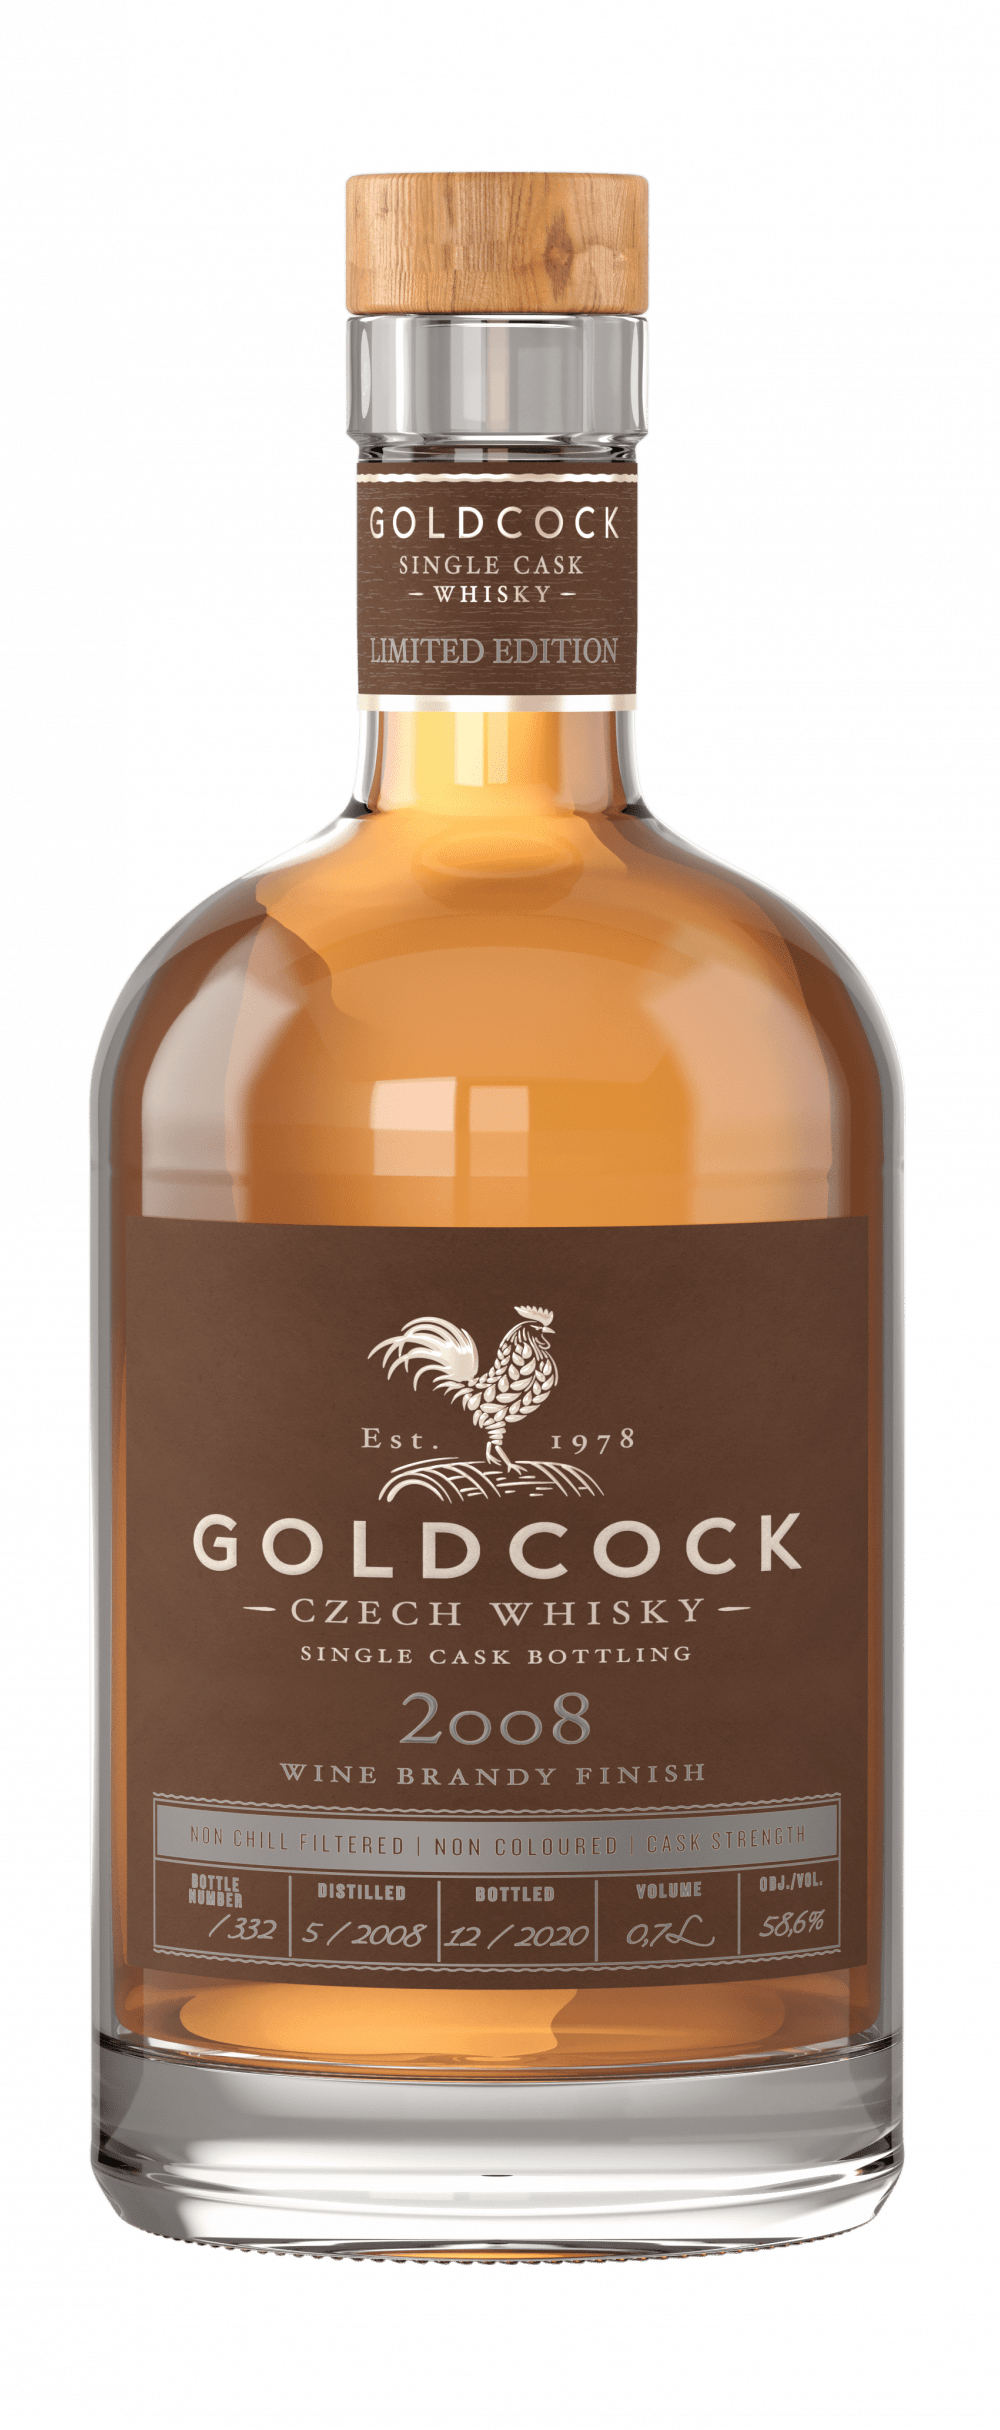 GOLDCOCK 2008 WINE BRANDY FINISH 58,6% 0,7L